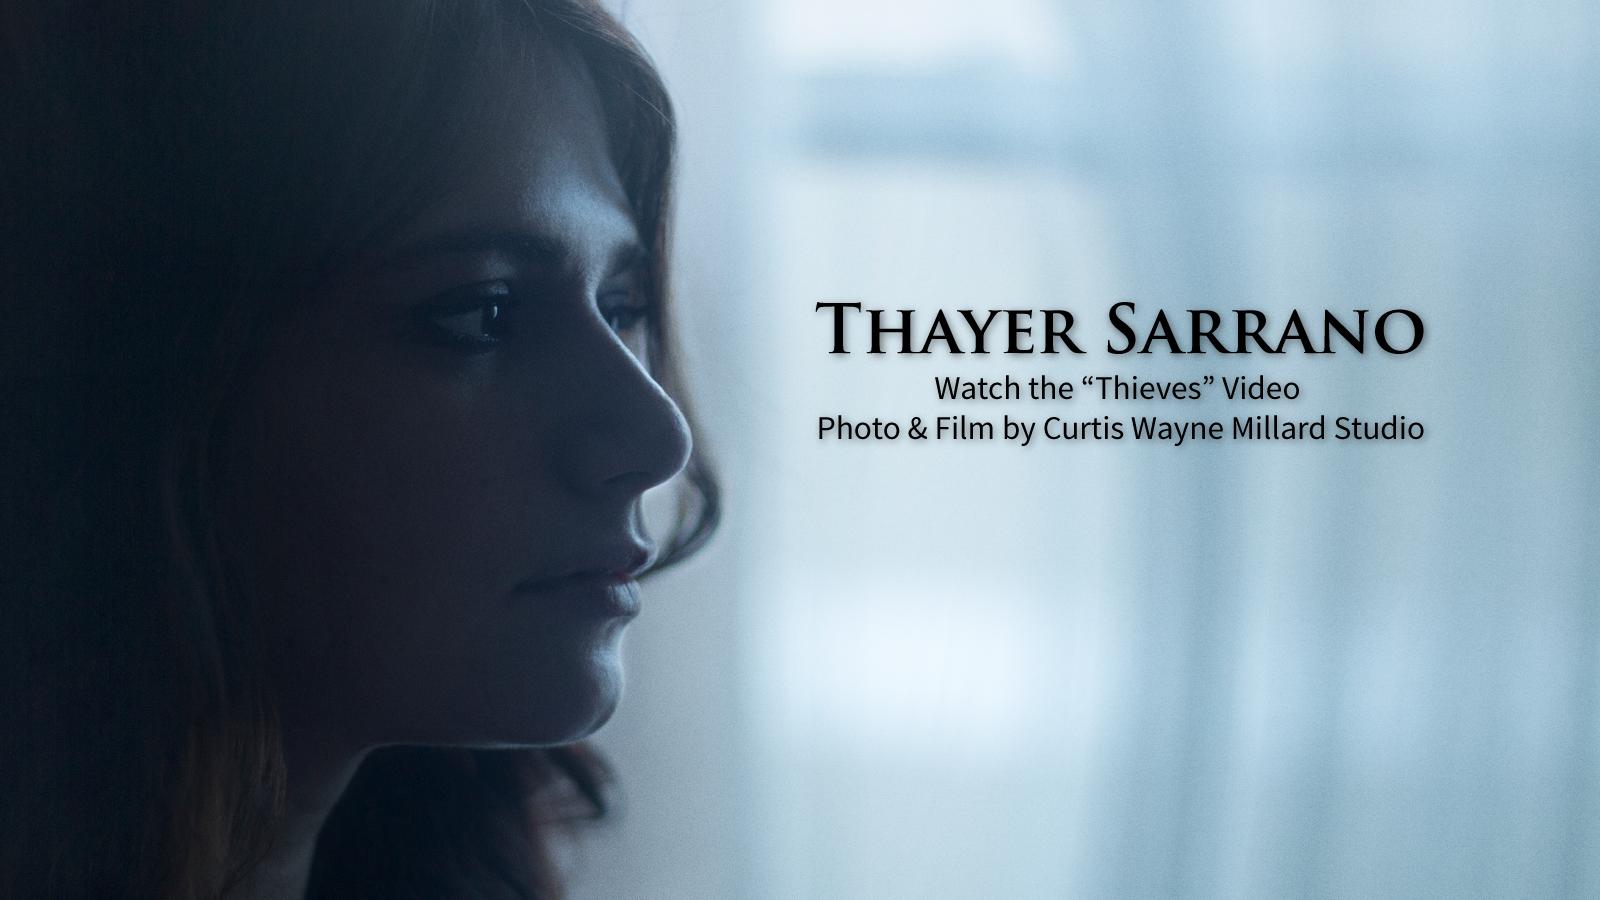 Thayer Sarrano. Thieves Video. Huffington Post. CWM Studio. Curtis Wayne Millard Studio.